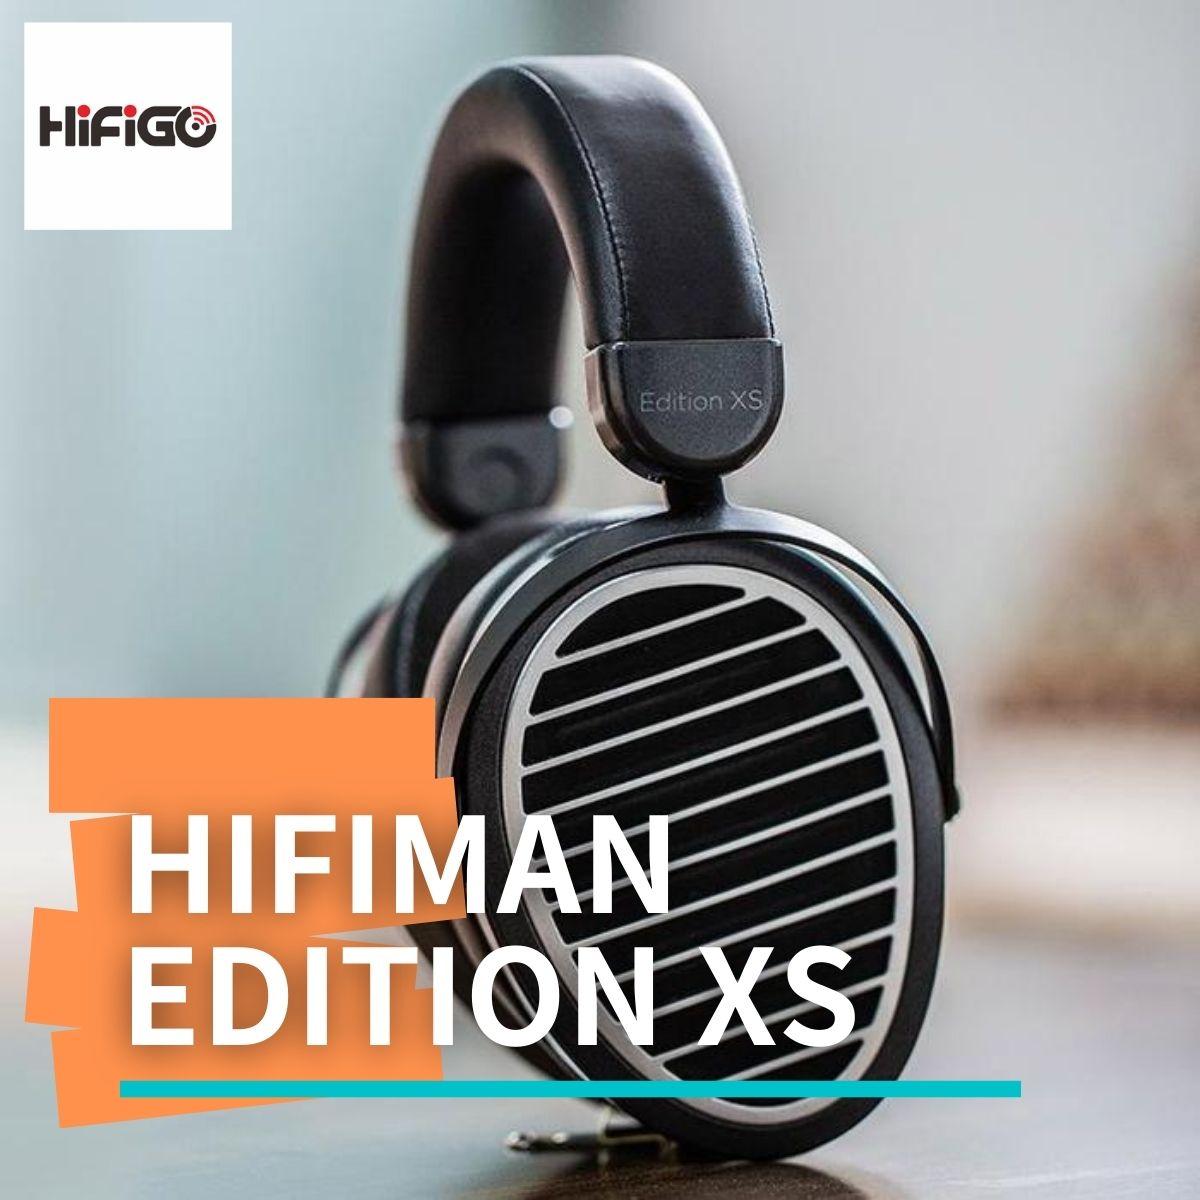 Hifiman Edition XS